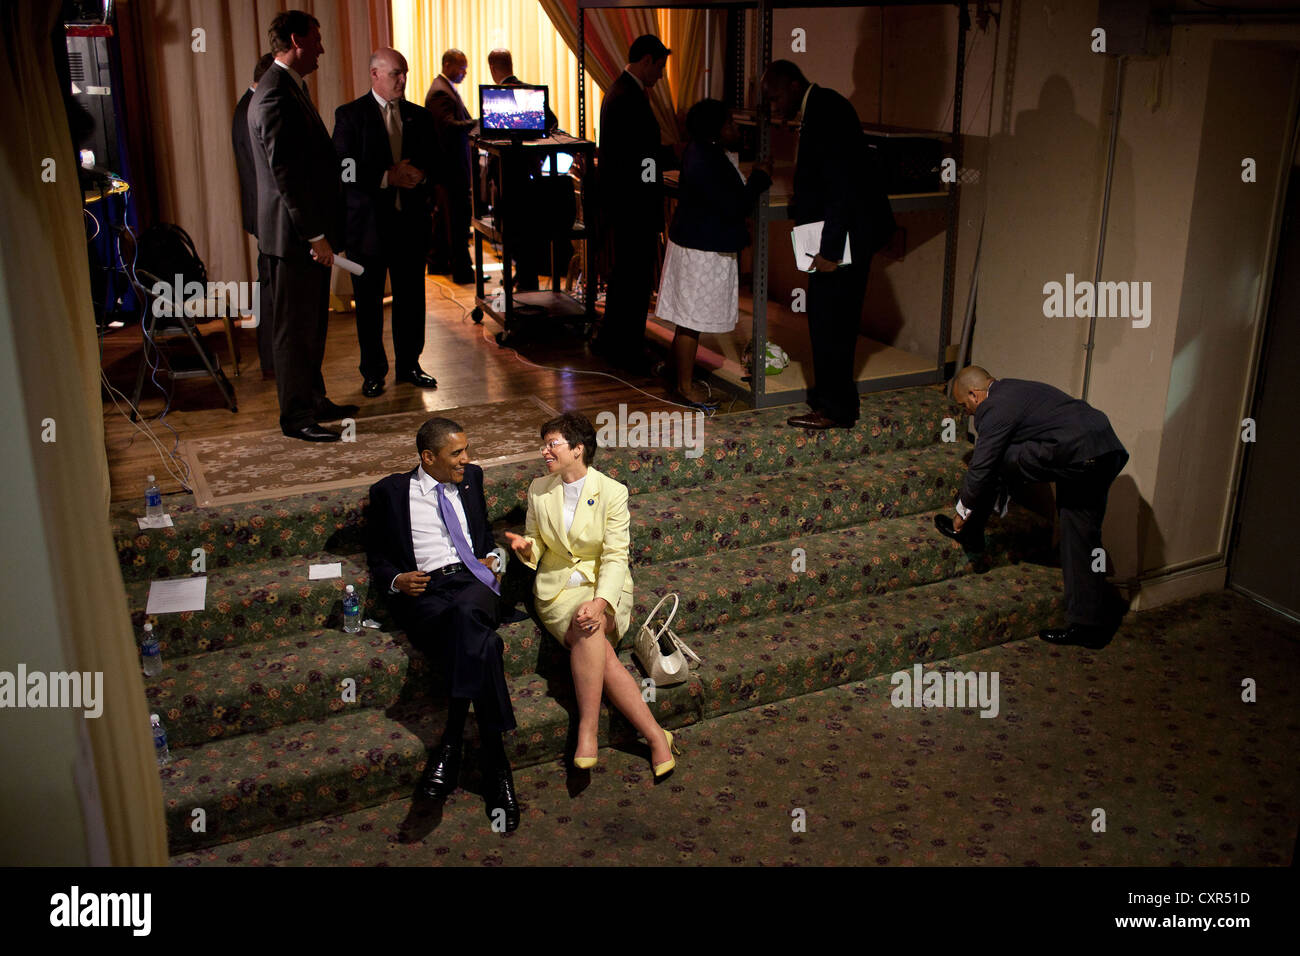 US President Barack Obama talks backstage with Senior Advisor Valerie Jarrett before a reception at the Hyatt at - Stock Image